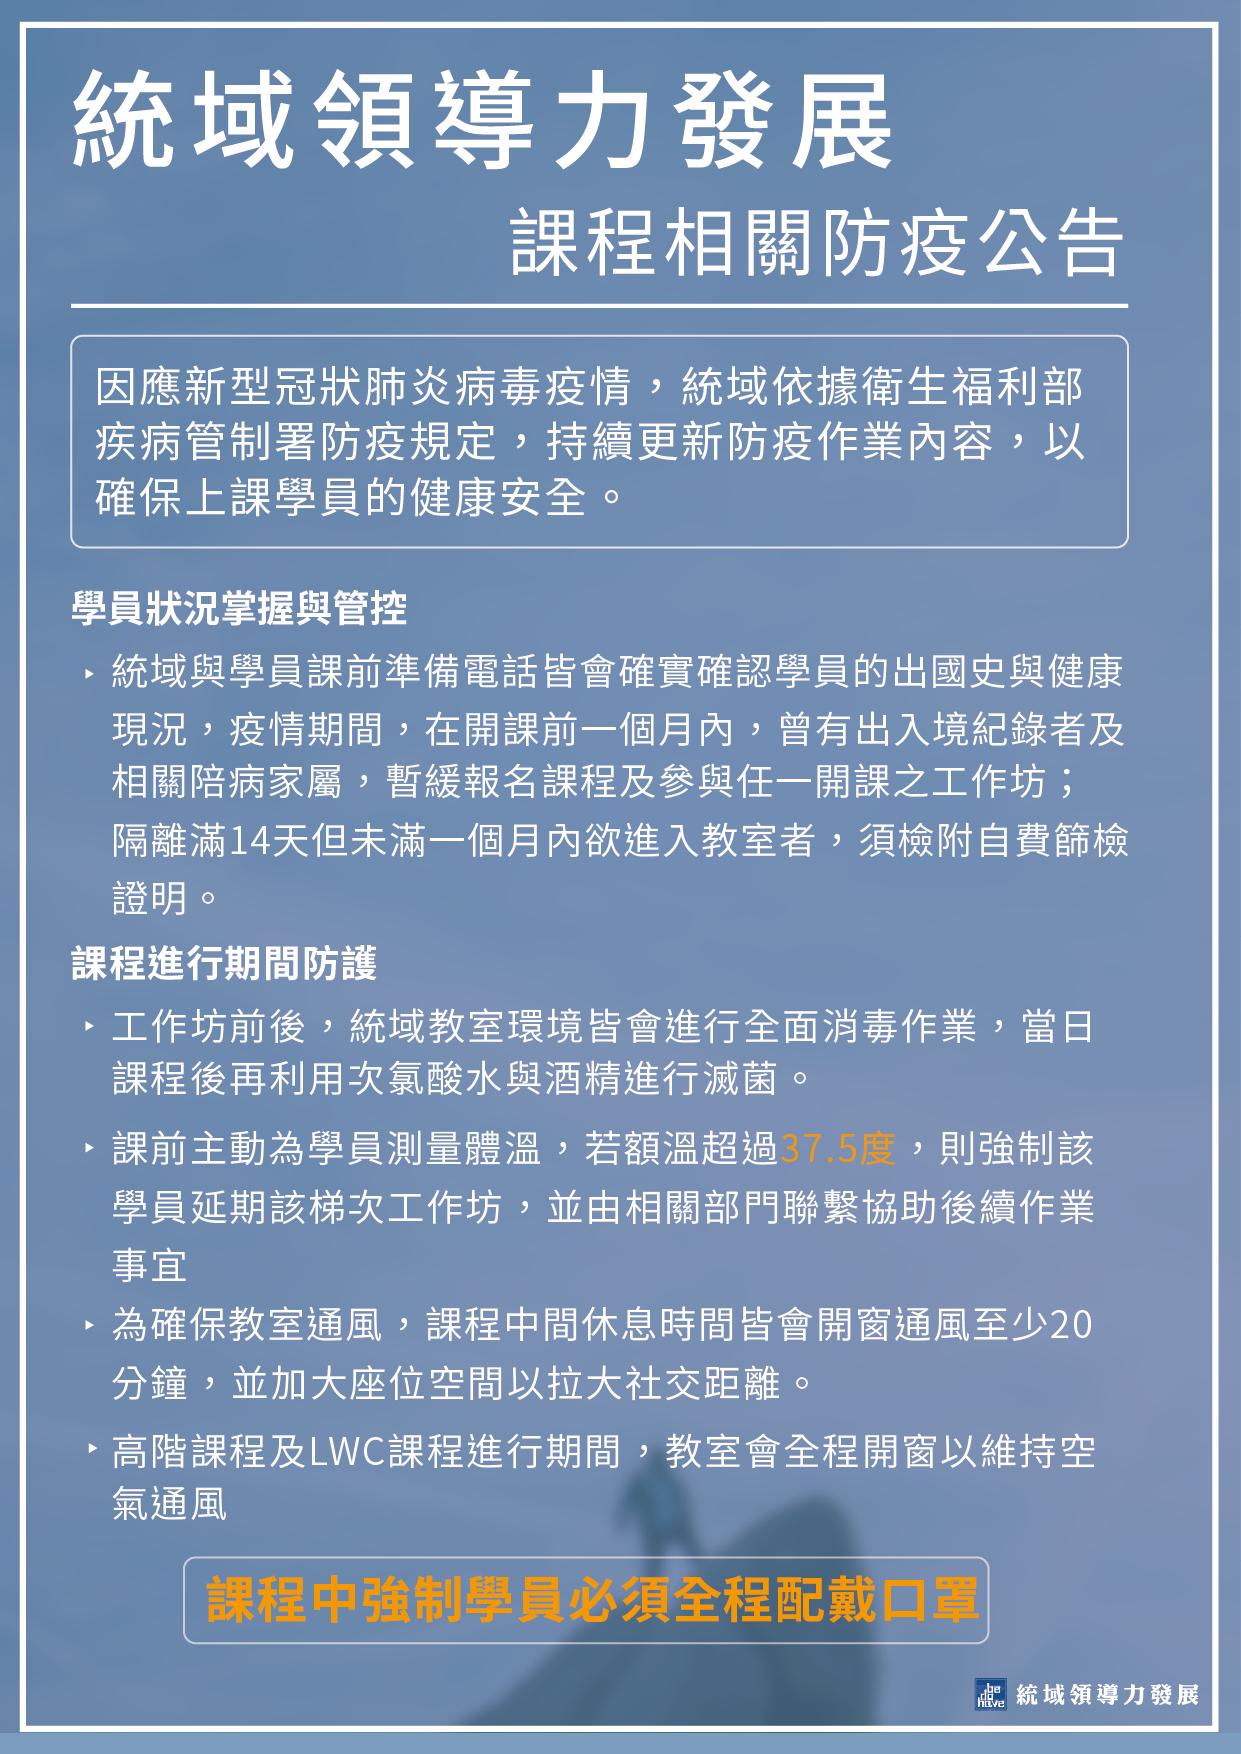 防疫公告09072-01